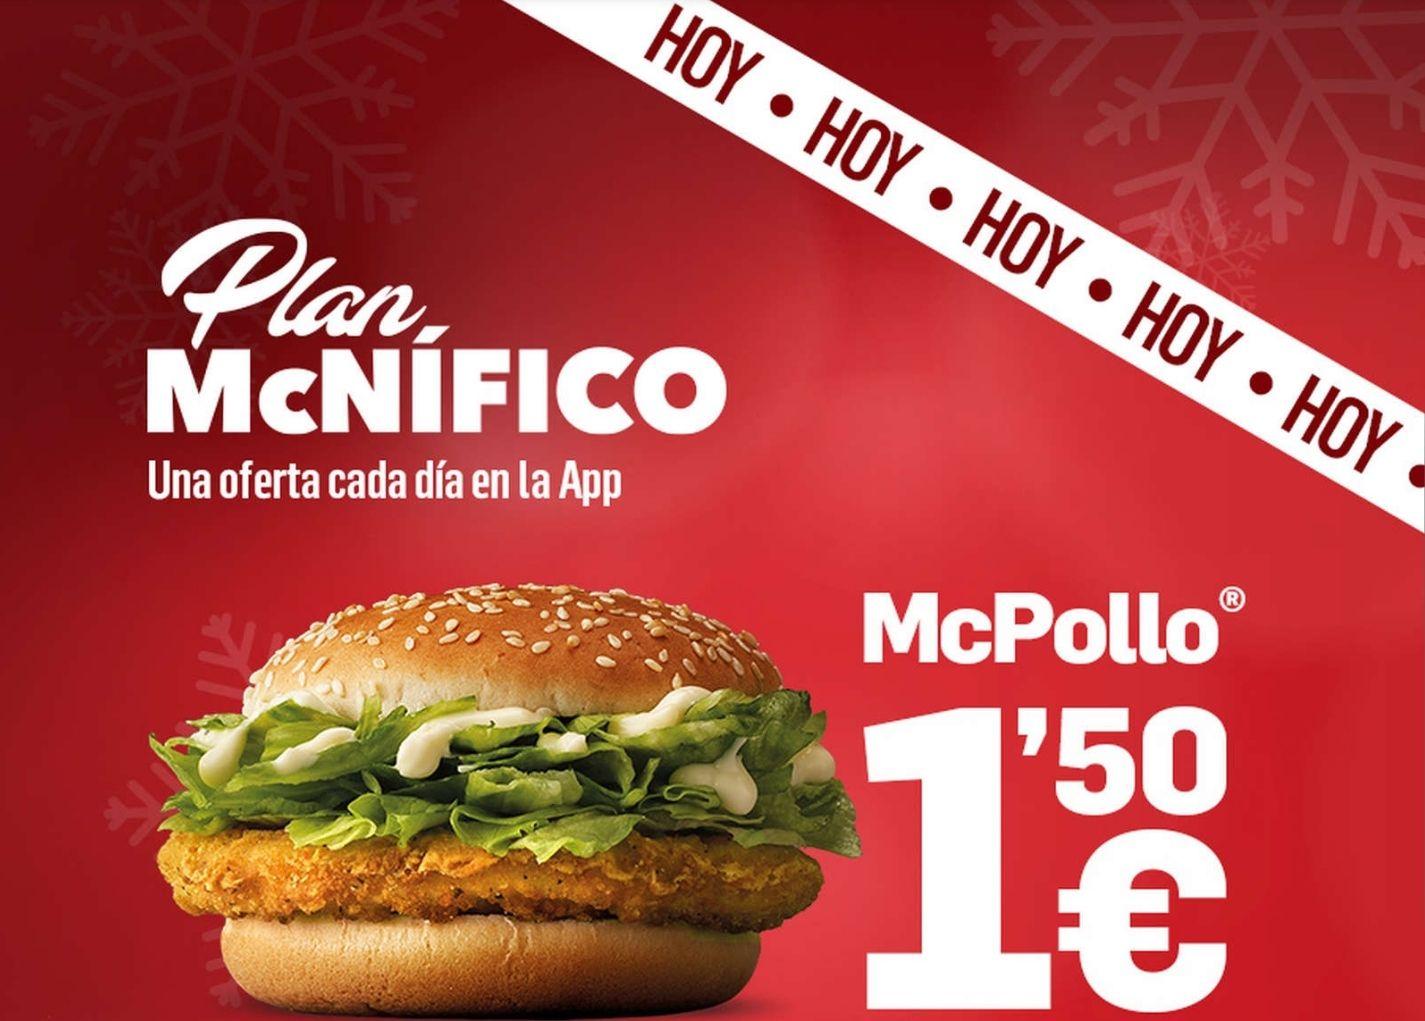 McPollo por sólo 1.50€